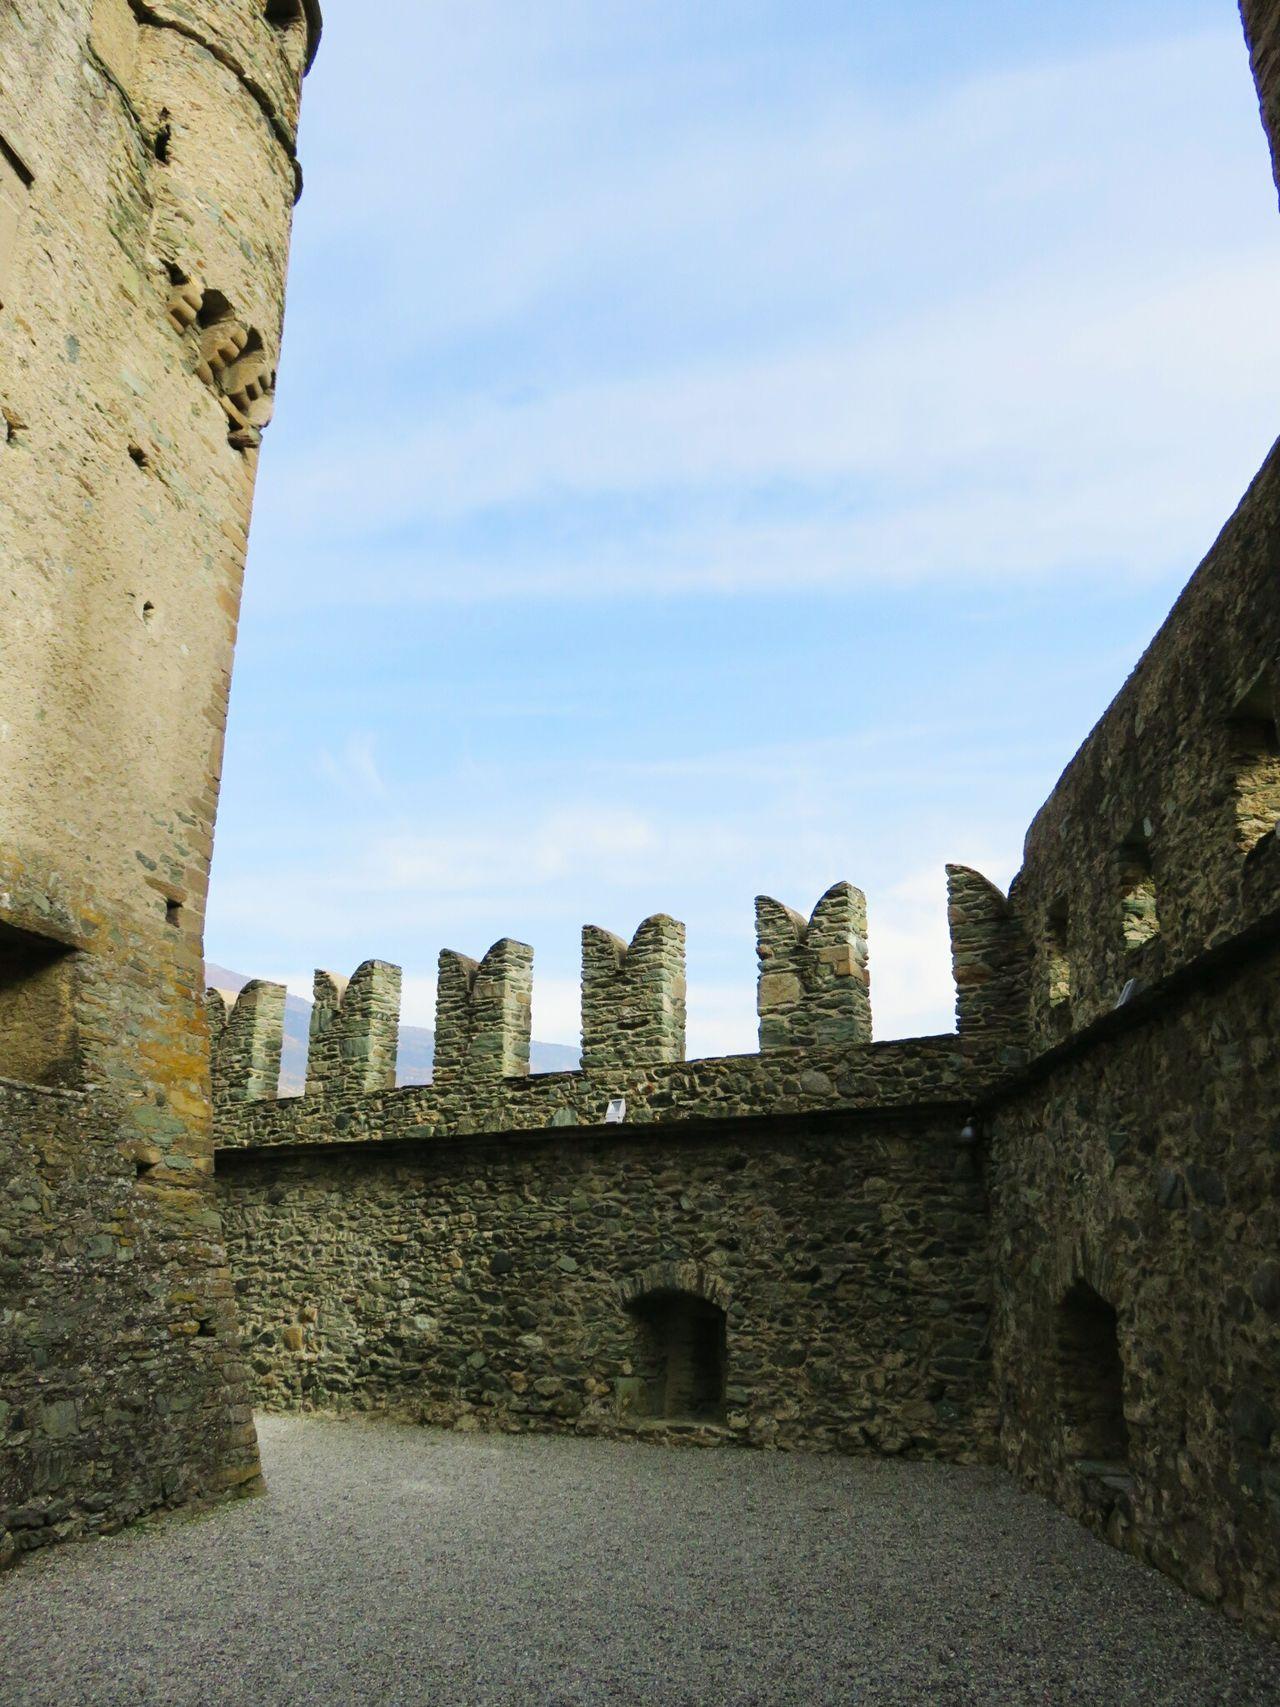 Castello di Fenis History Outdoors No People Sky Day Medieval Tranquil Scene Stone Rocks Aosta Italia Italy Castel